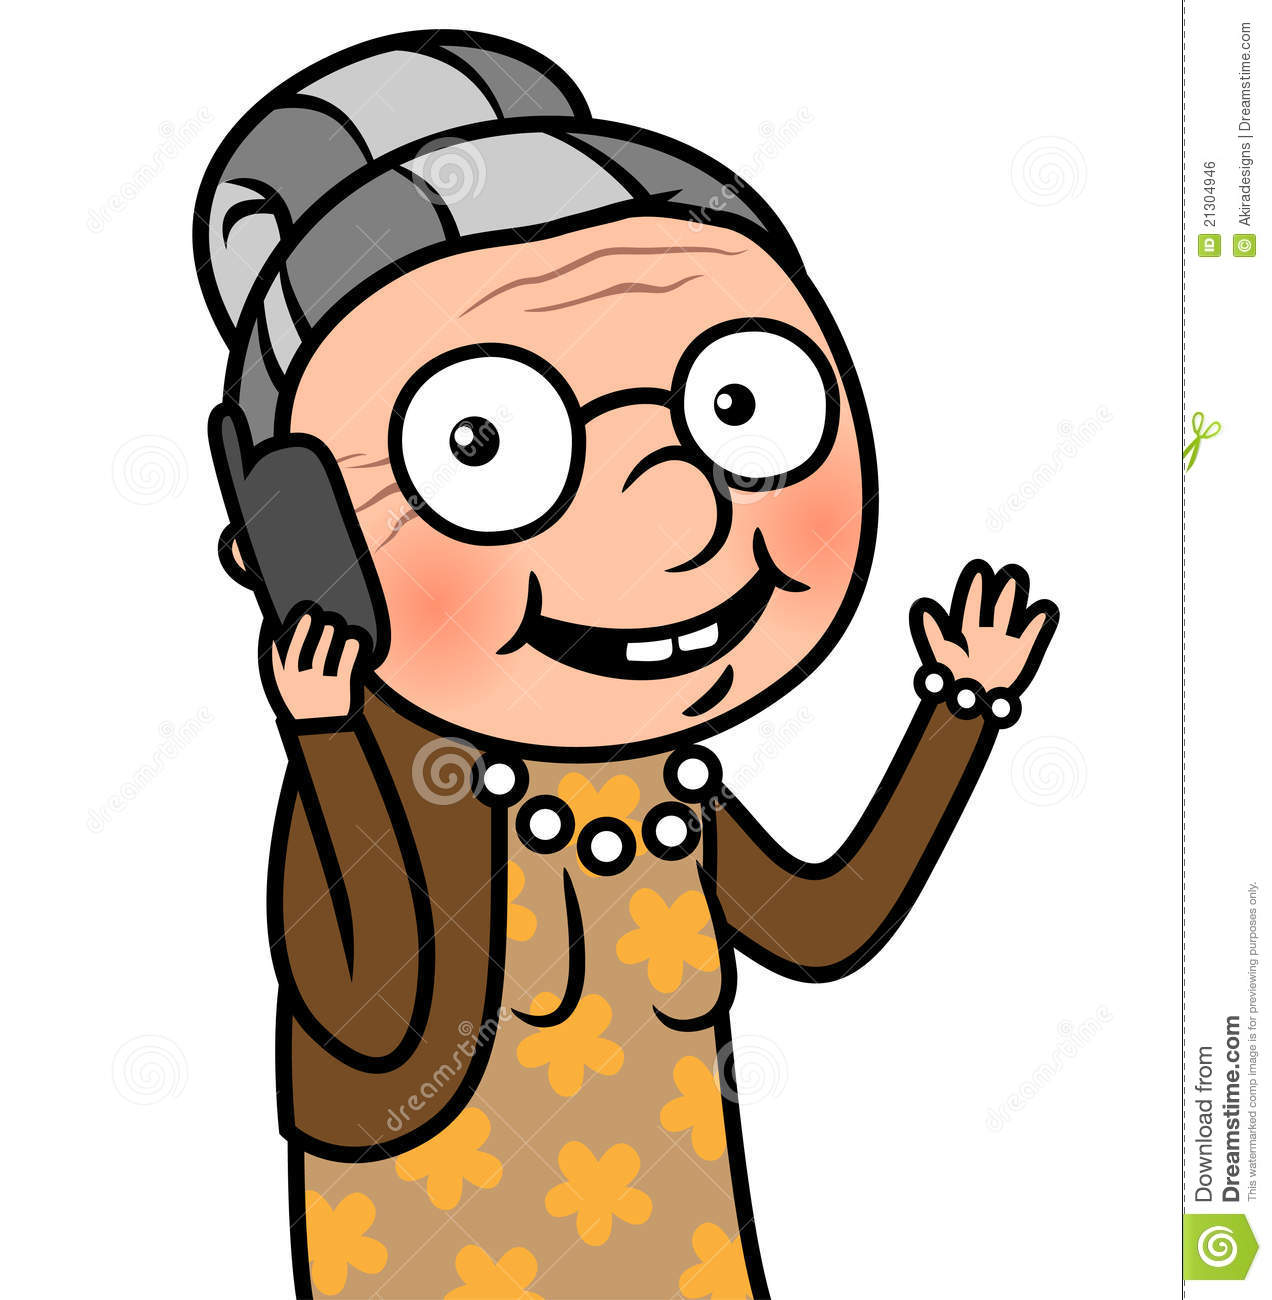 Talk On The Phone Clipart.-Talk On The Phone Clipart.-5